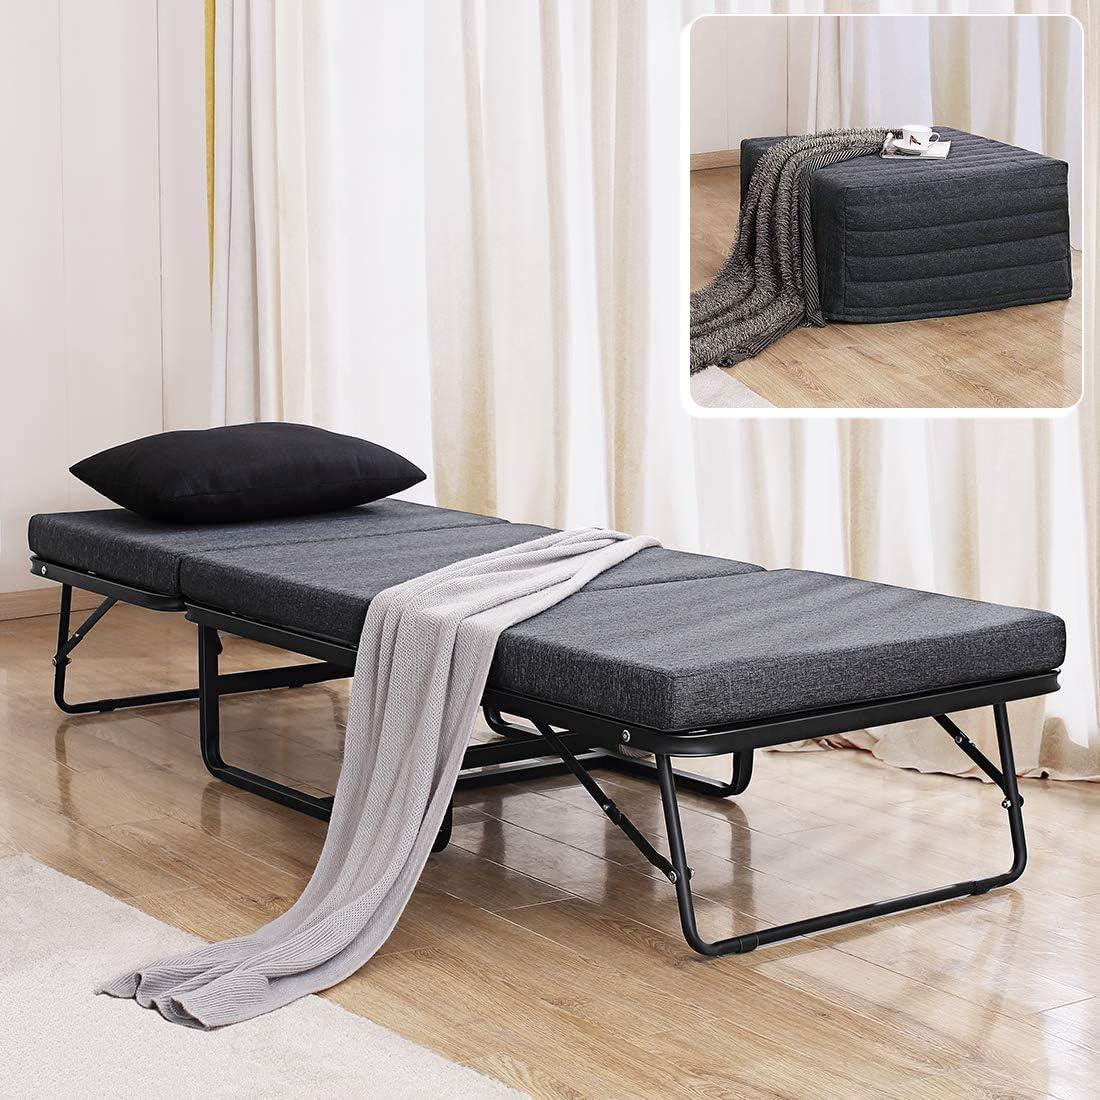 - Amazon.com: TATAGO Premium Ottoman Folding Bed With Steel Mesh